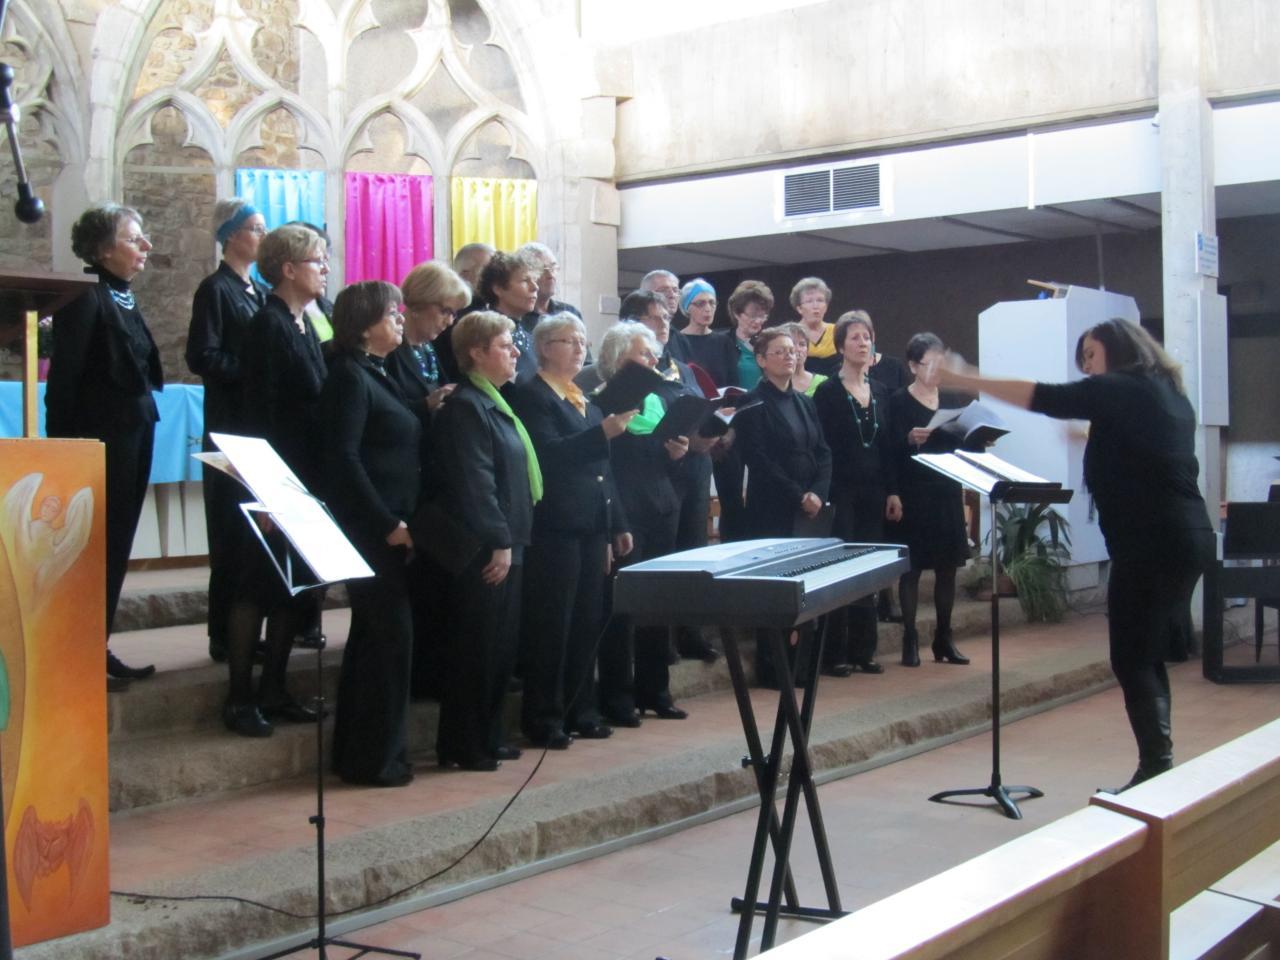 Harmonia 2 février 2013 - Laval